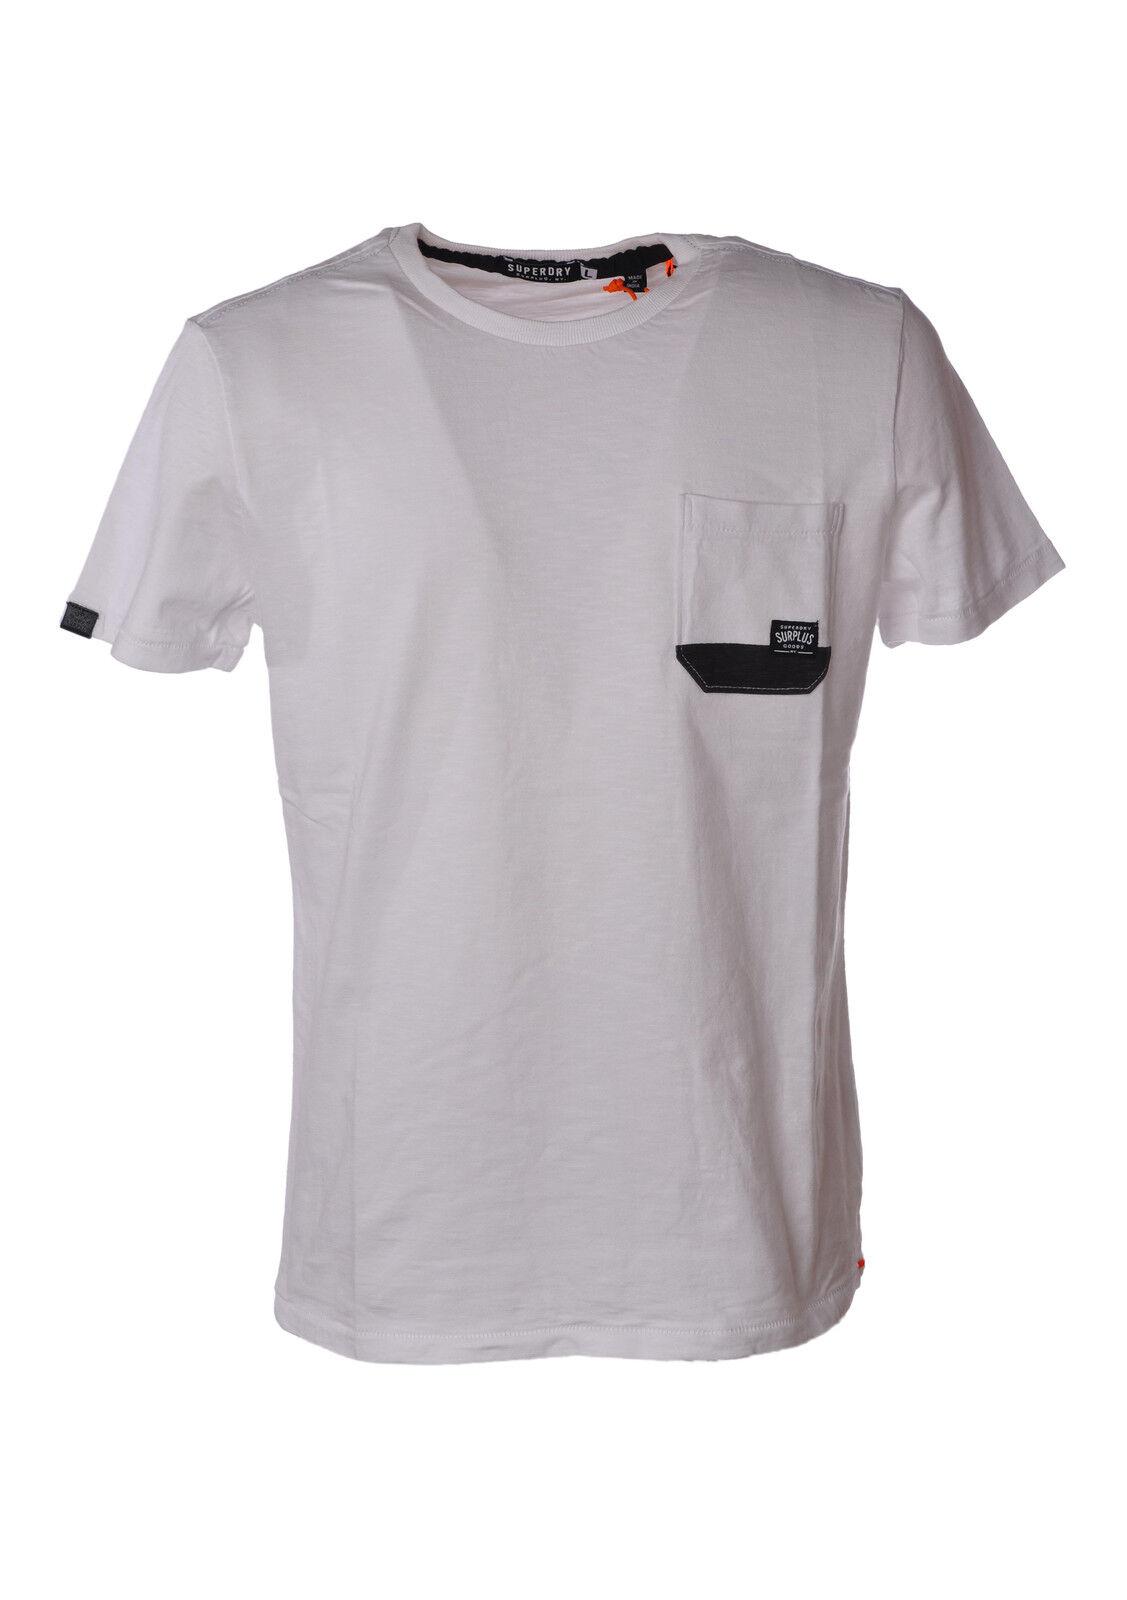 Superdry  -  T - Hombre - Blanco - 3478321A183923